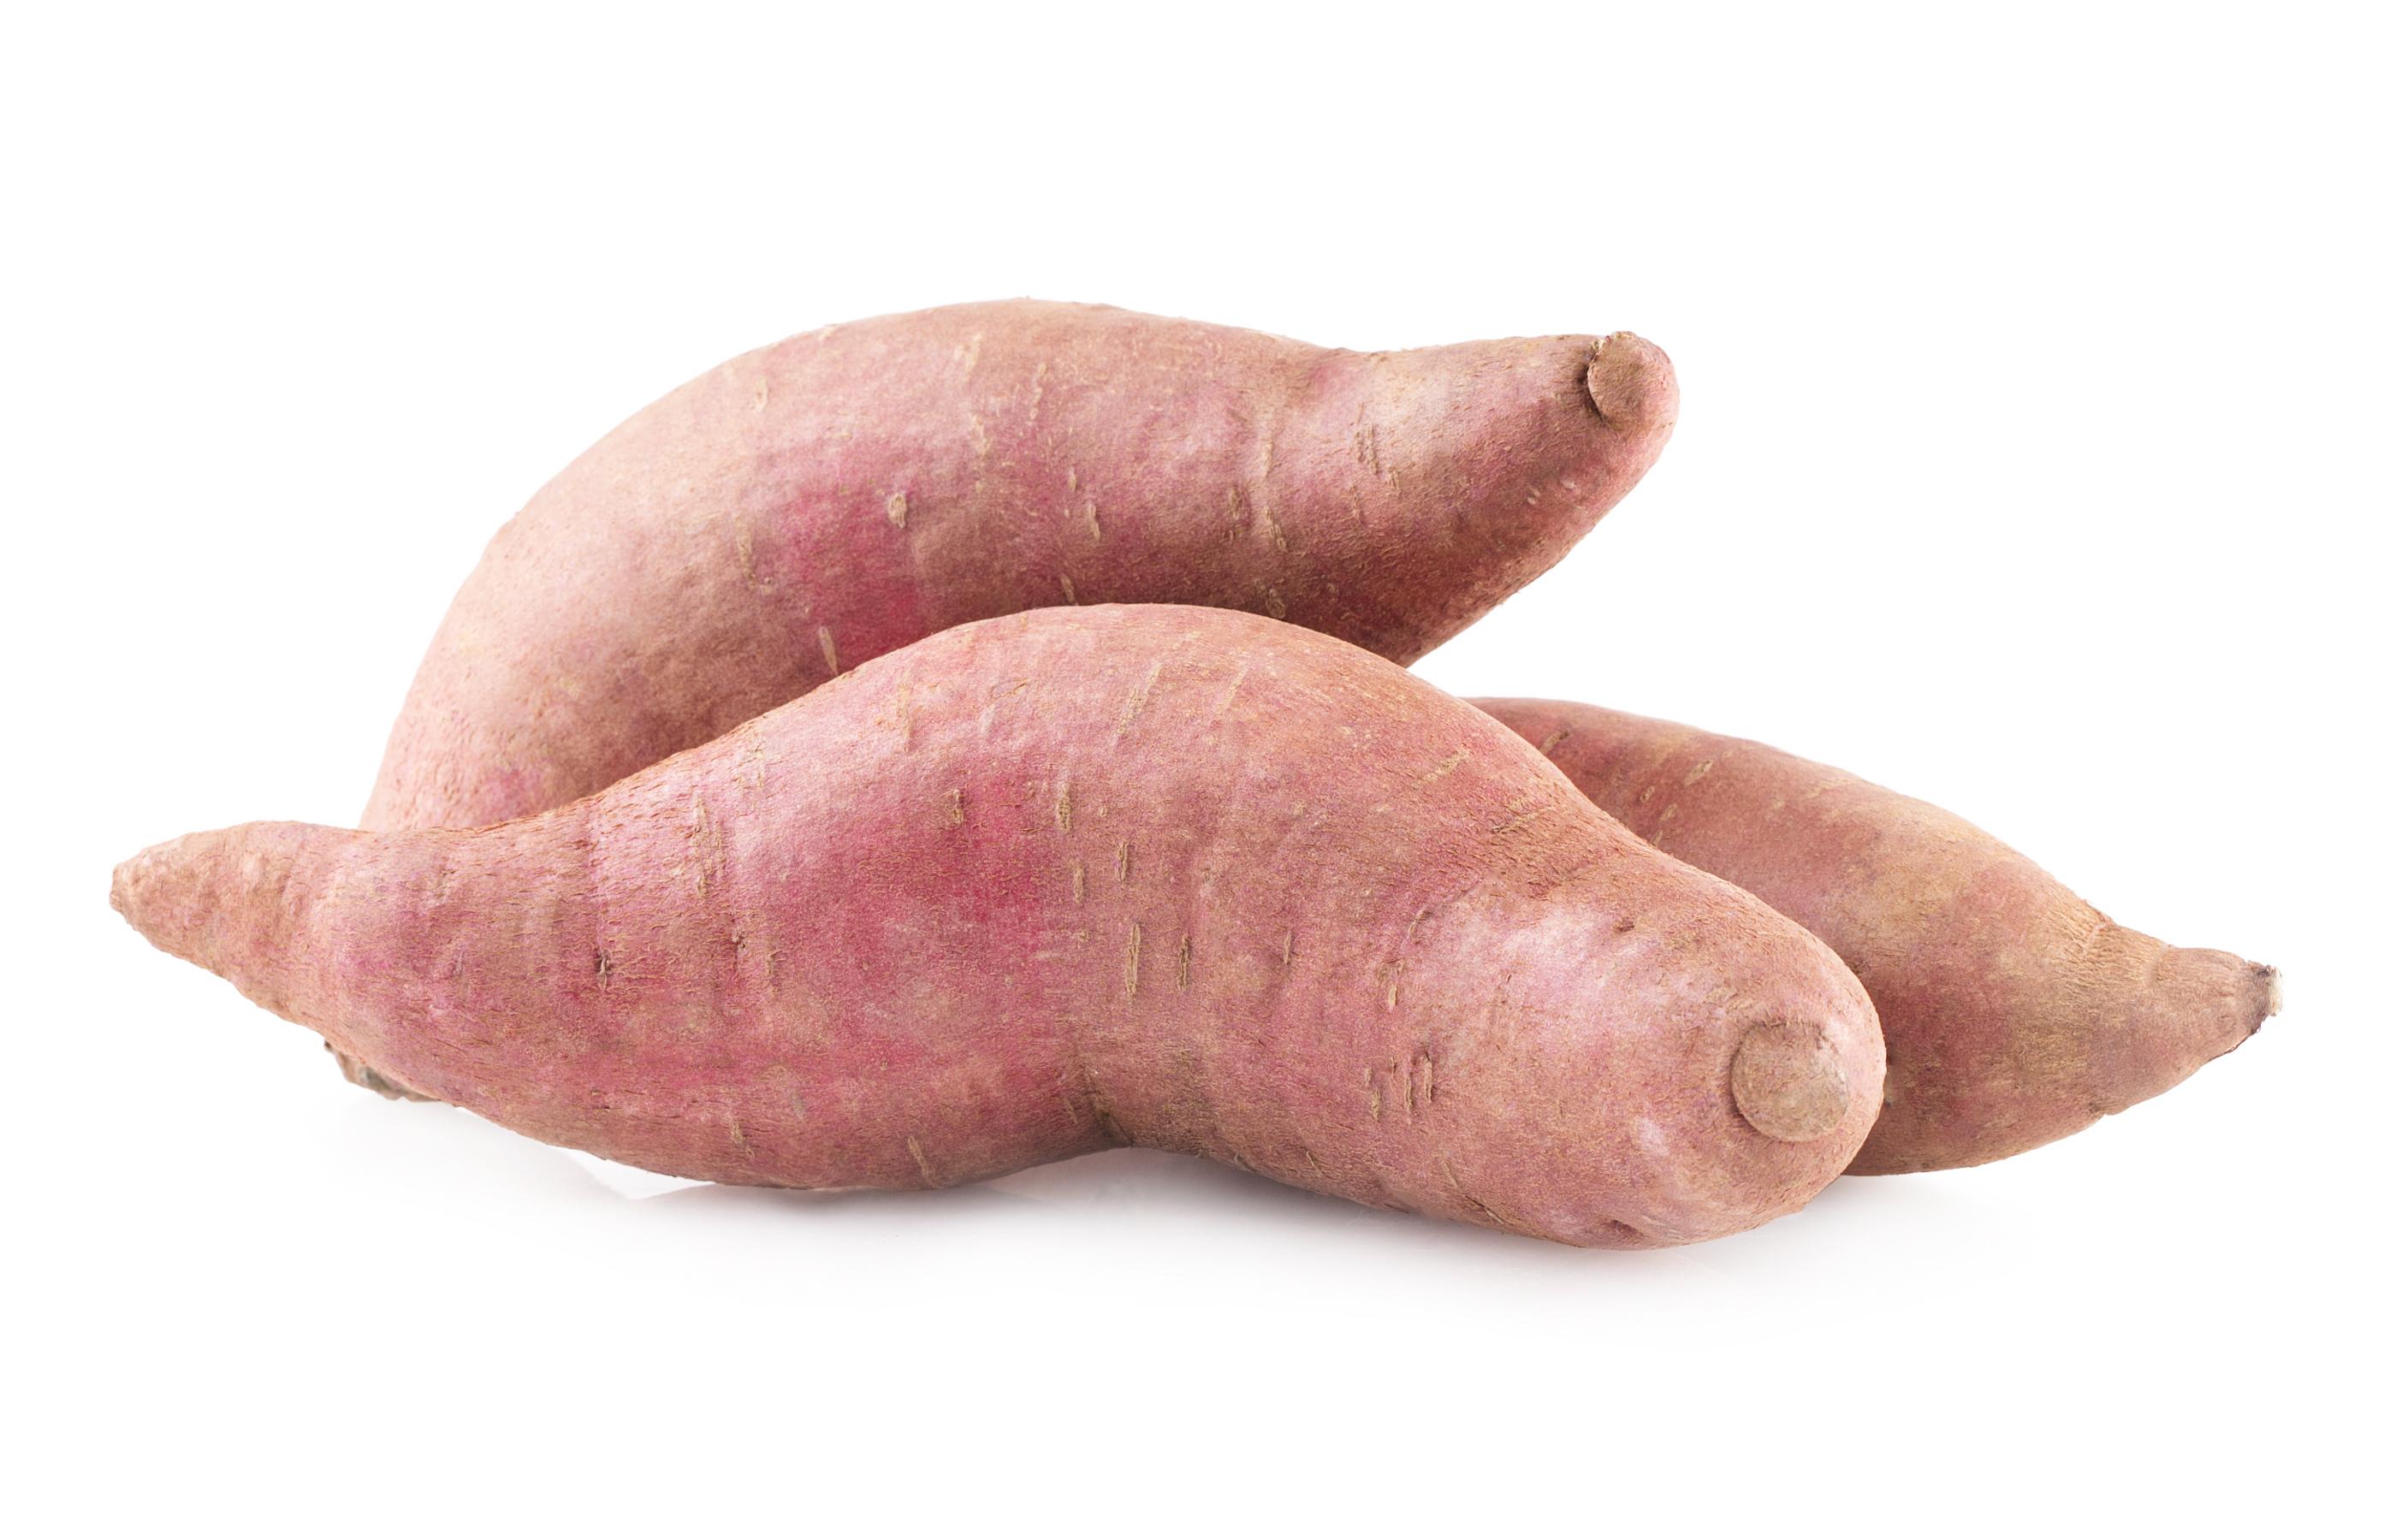 Sweet potatoes photo